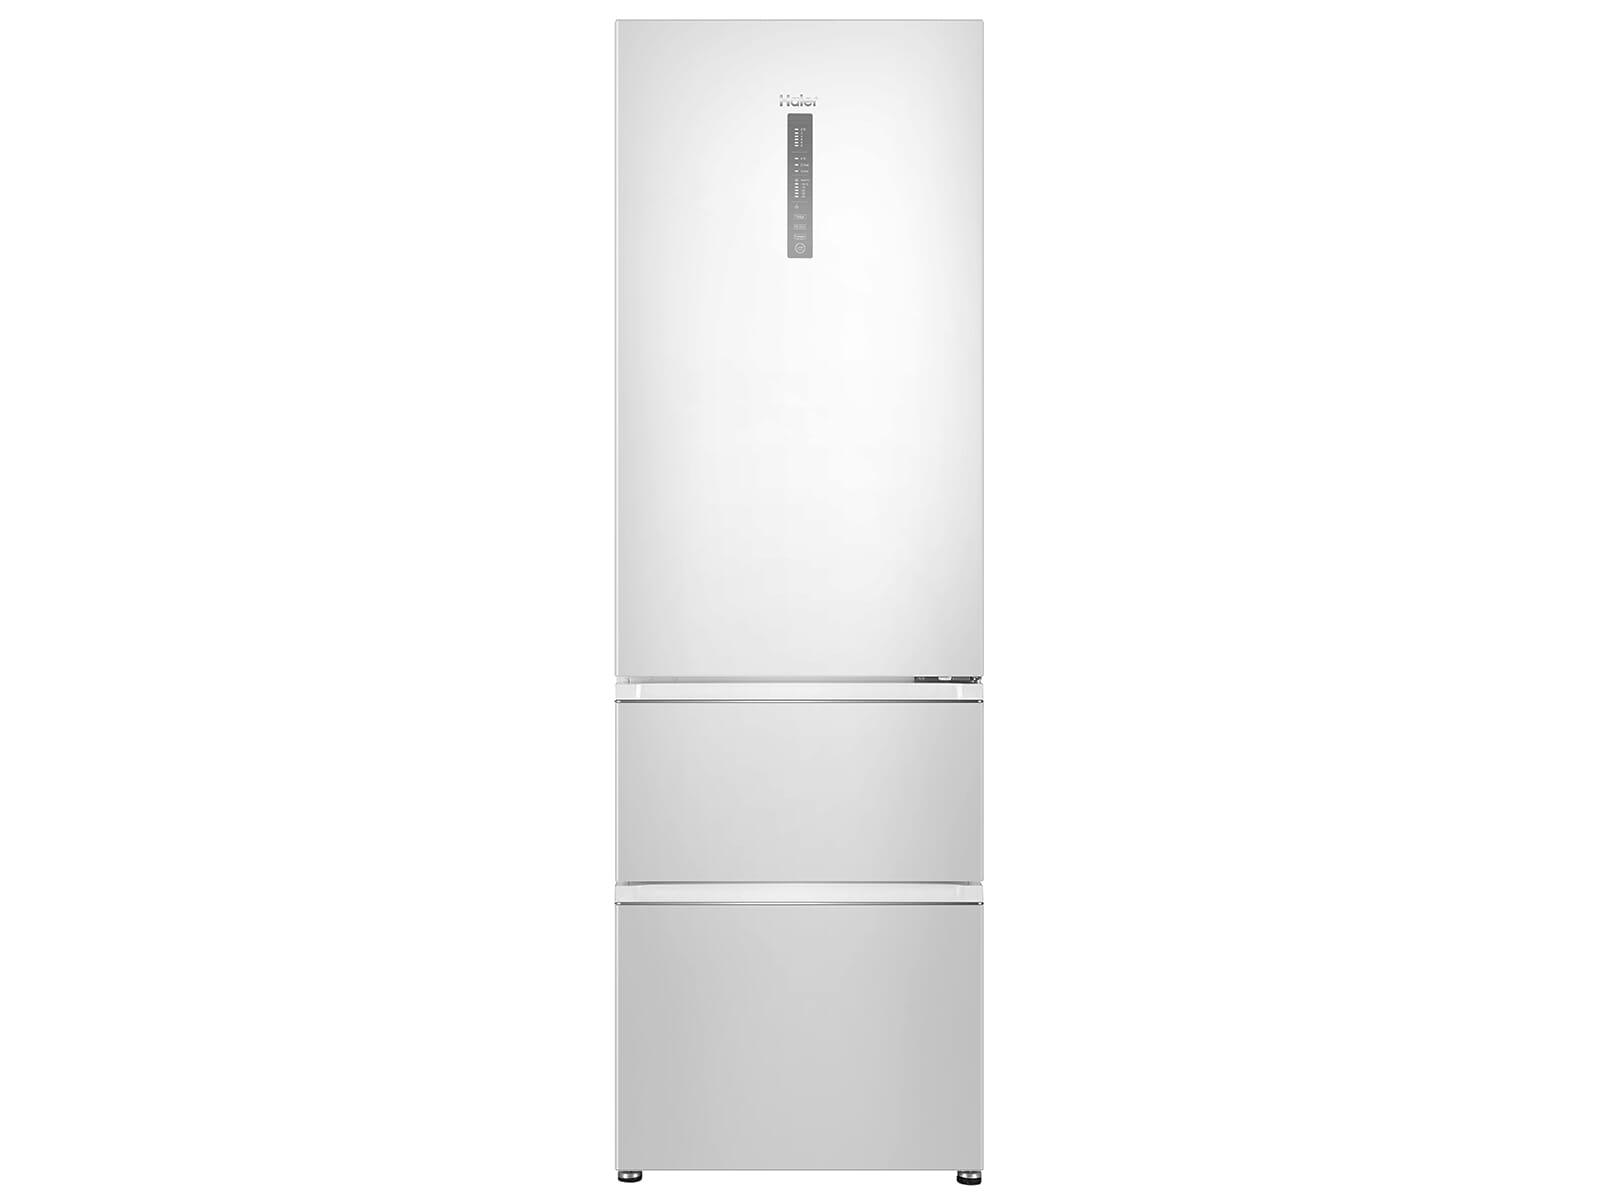 Kühlschrank Haier : Haier hb fmaaa french door kühl gefrier kombination edelstahllook